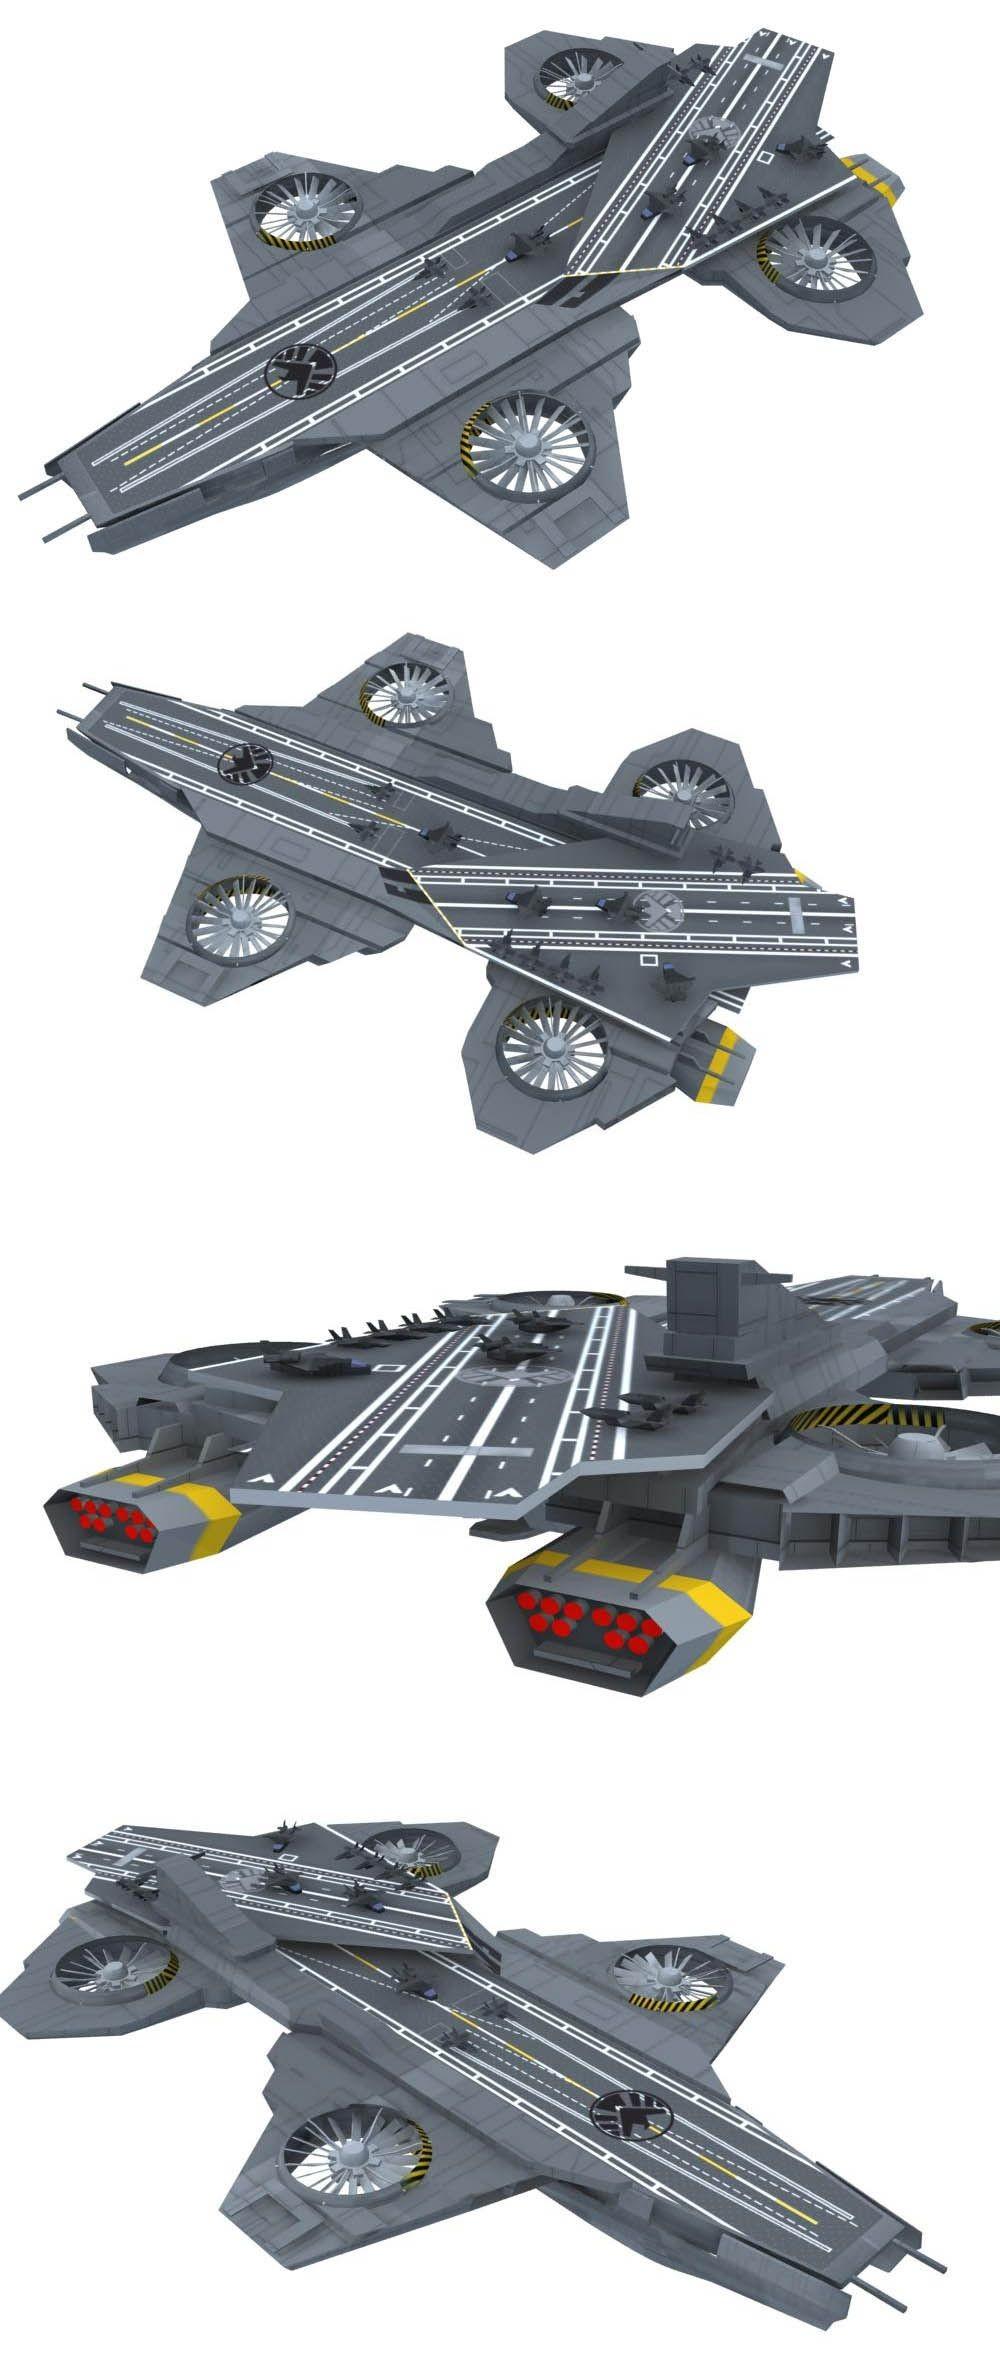 Lightsaber Papercraft S H I E L D Helicarrier 1 800